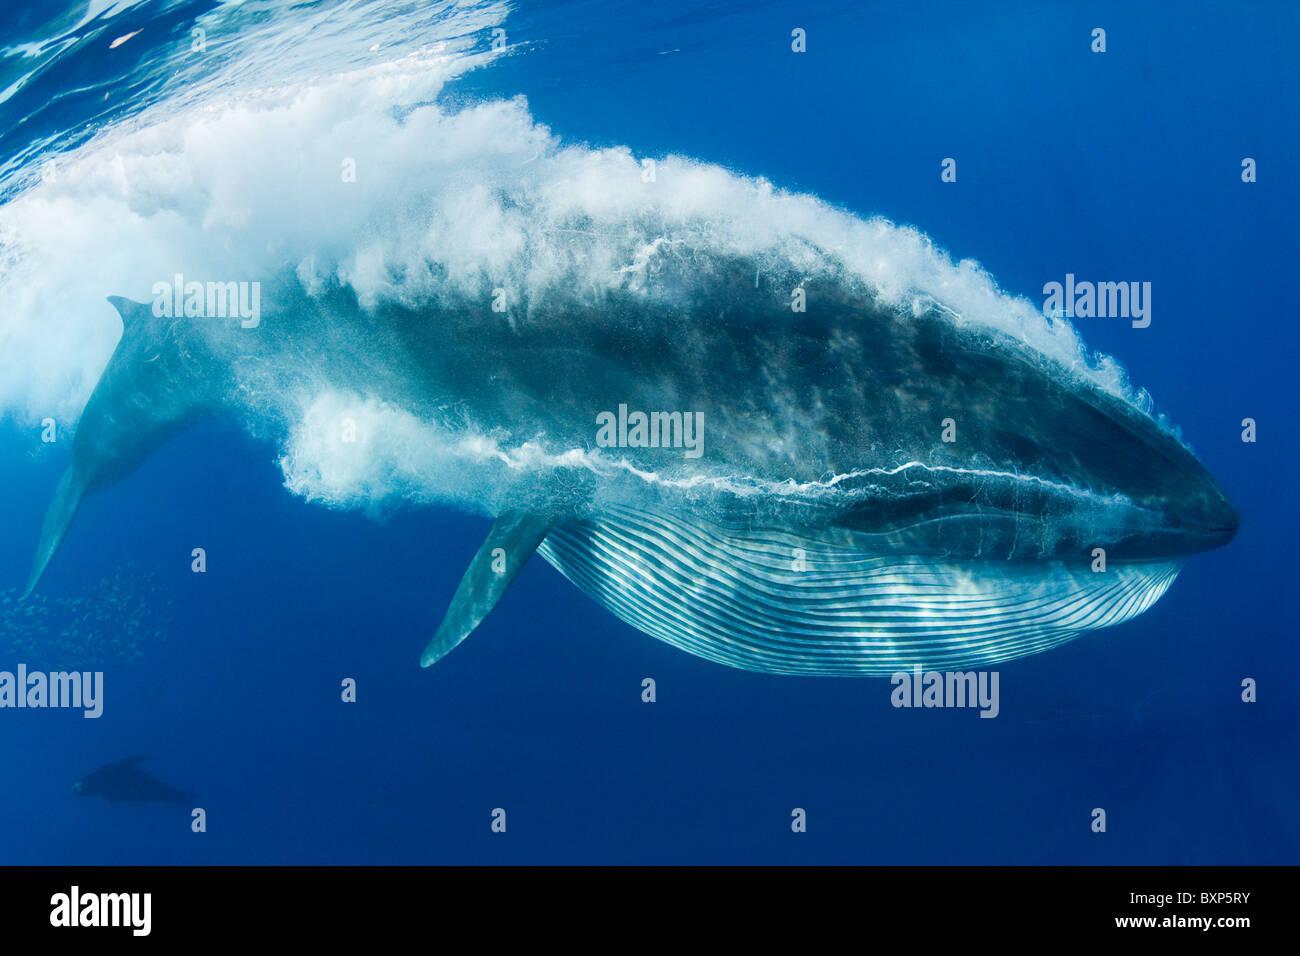 Bryde's whale, Balaenoptera brydei or Balaenoptera edeni, feeding on sardines, Baja California, Mexico ( Eastern - Stock Image